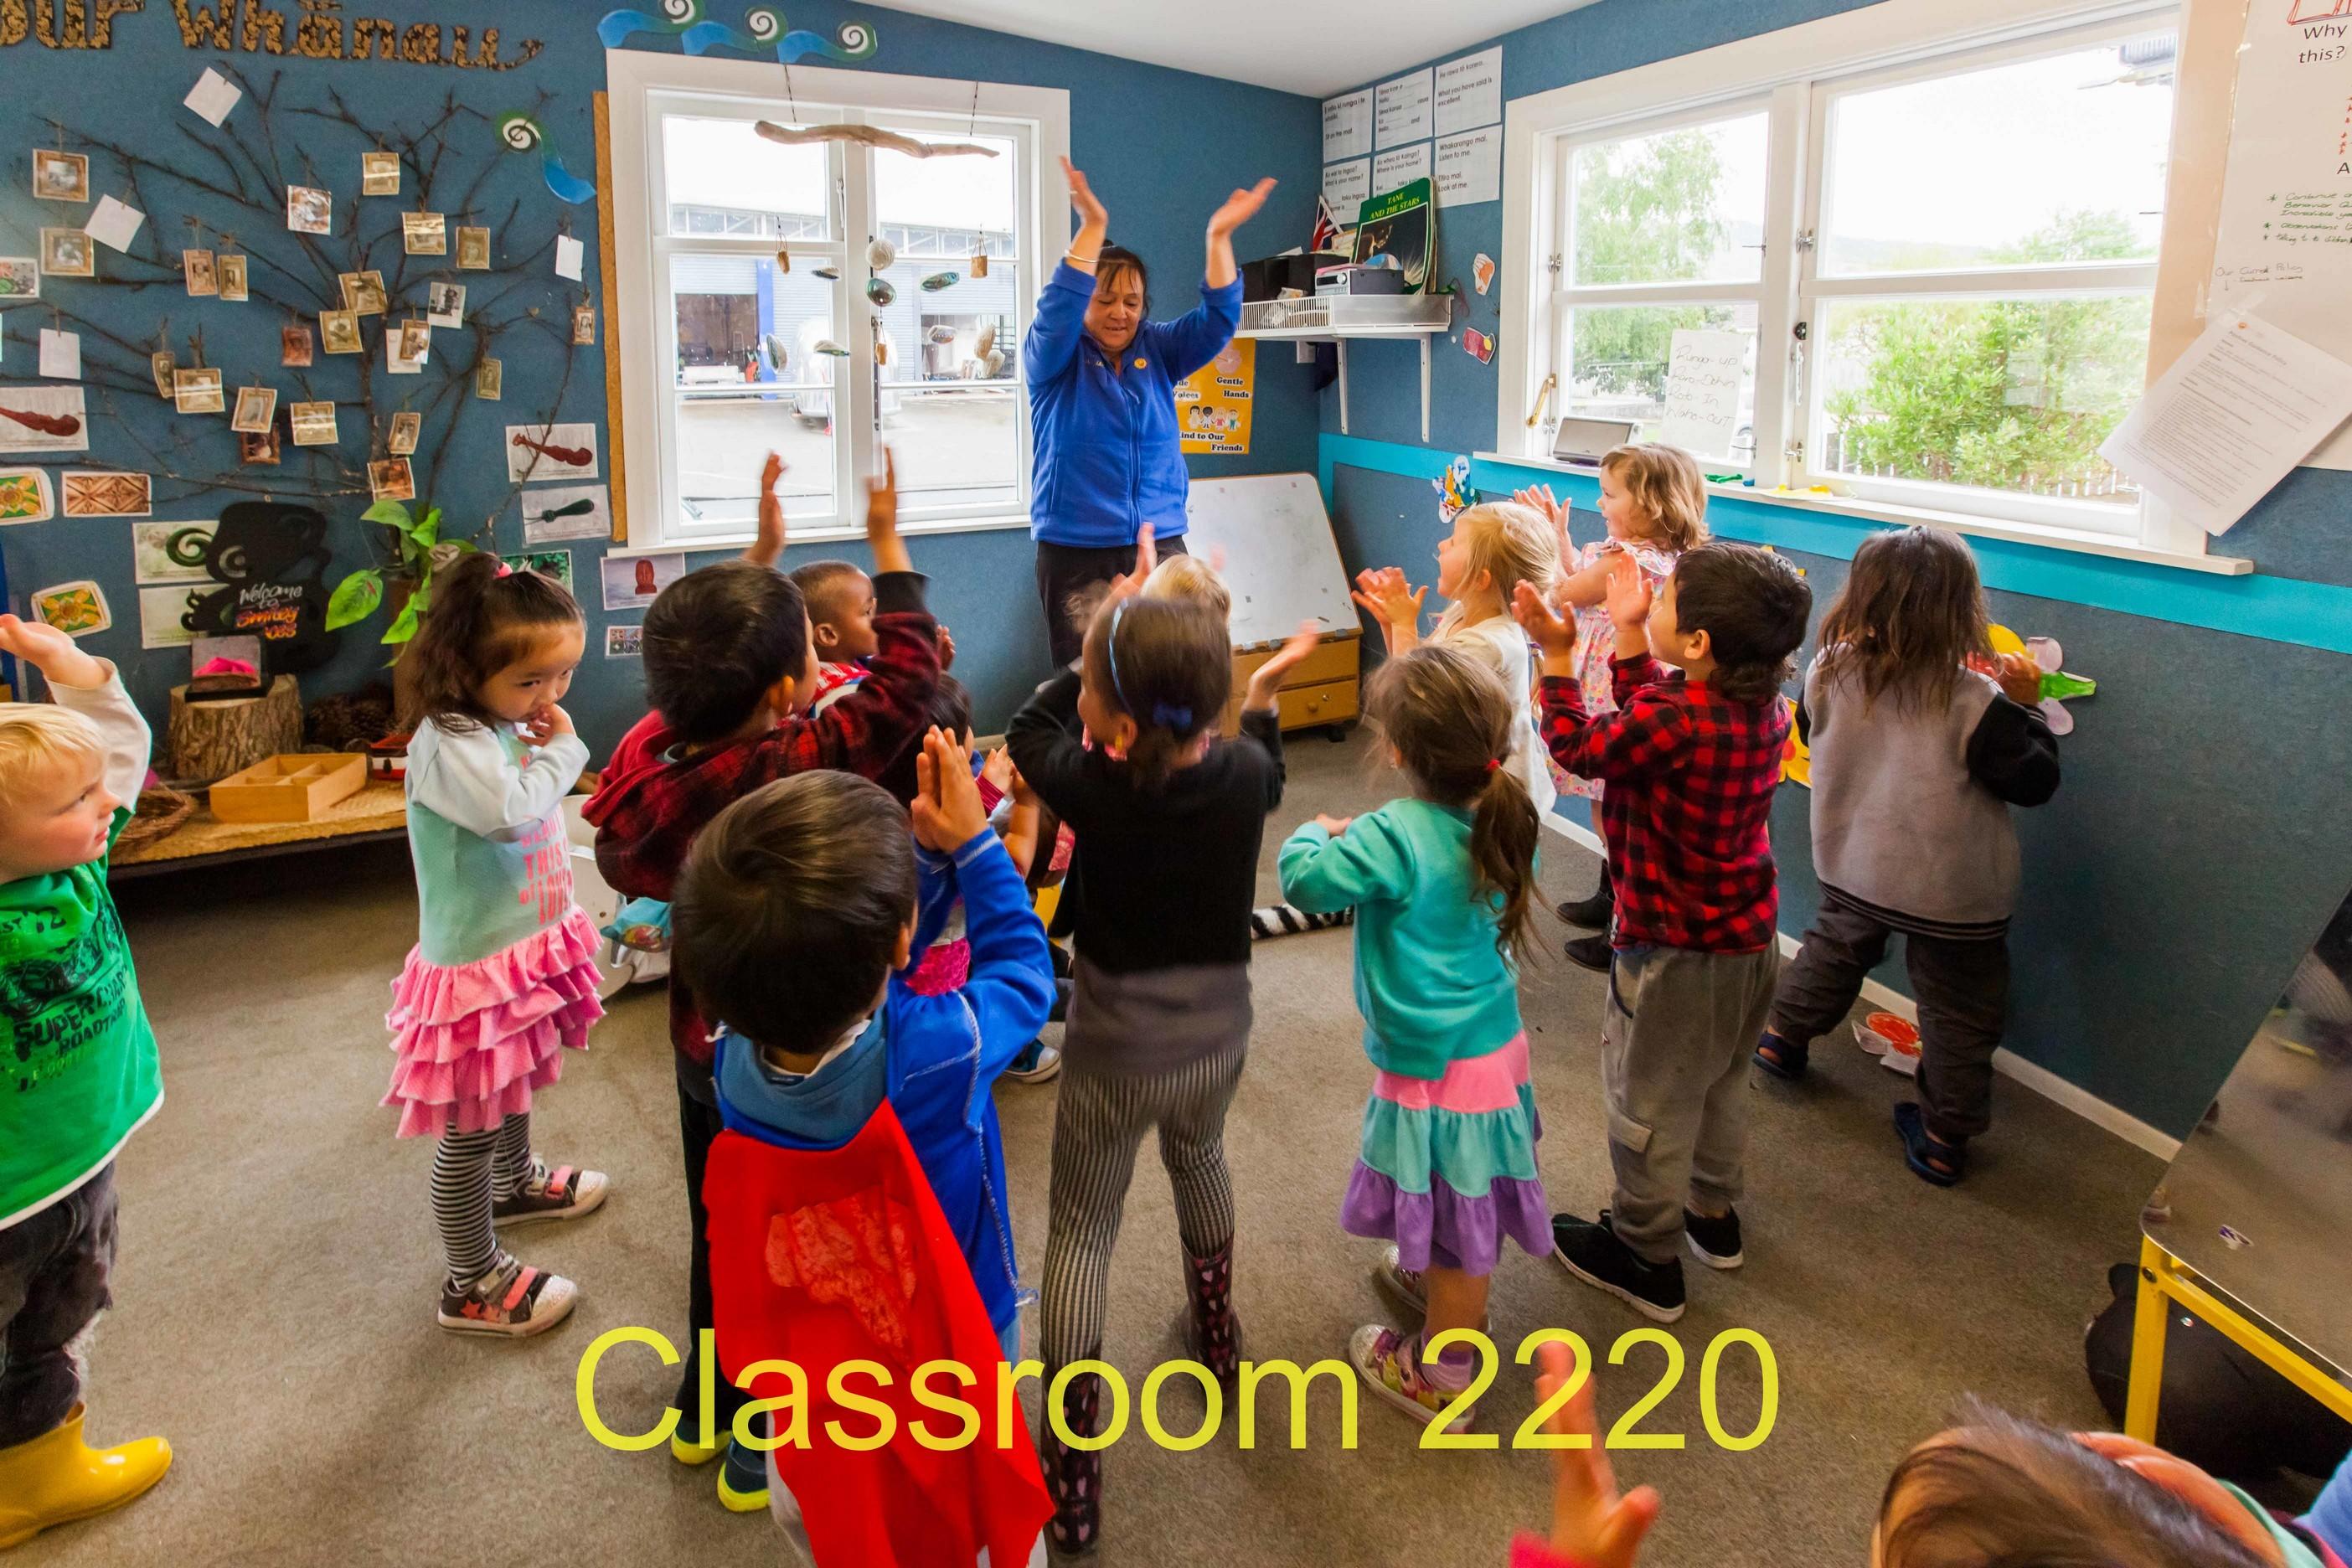 Classroom 2220